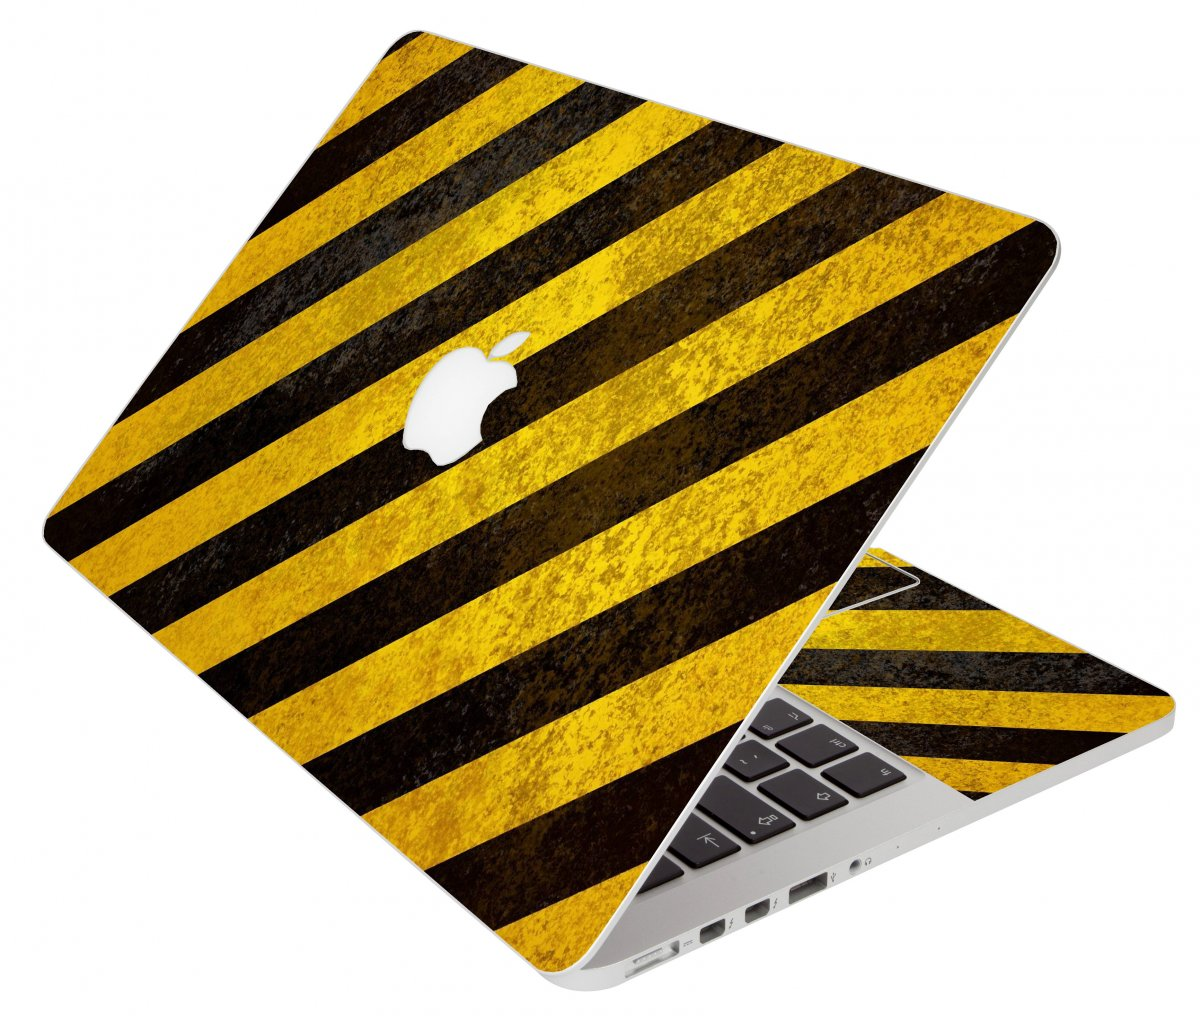 Caution Stripes Apple Macbook Pro 17 A1151 Laptop Skin